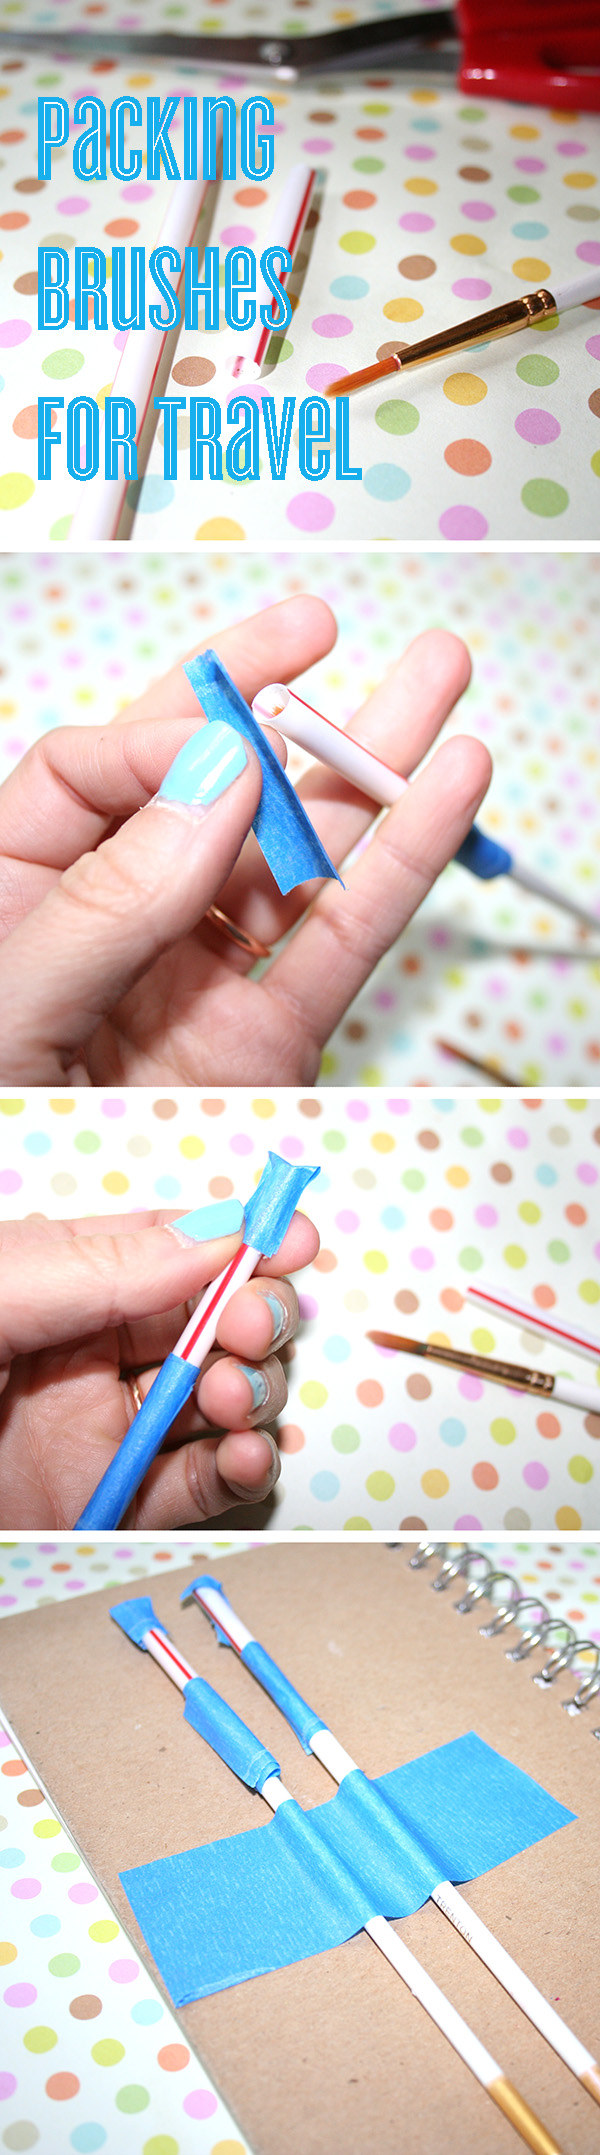 Pack brushes